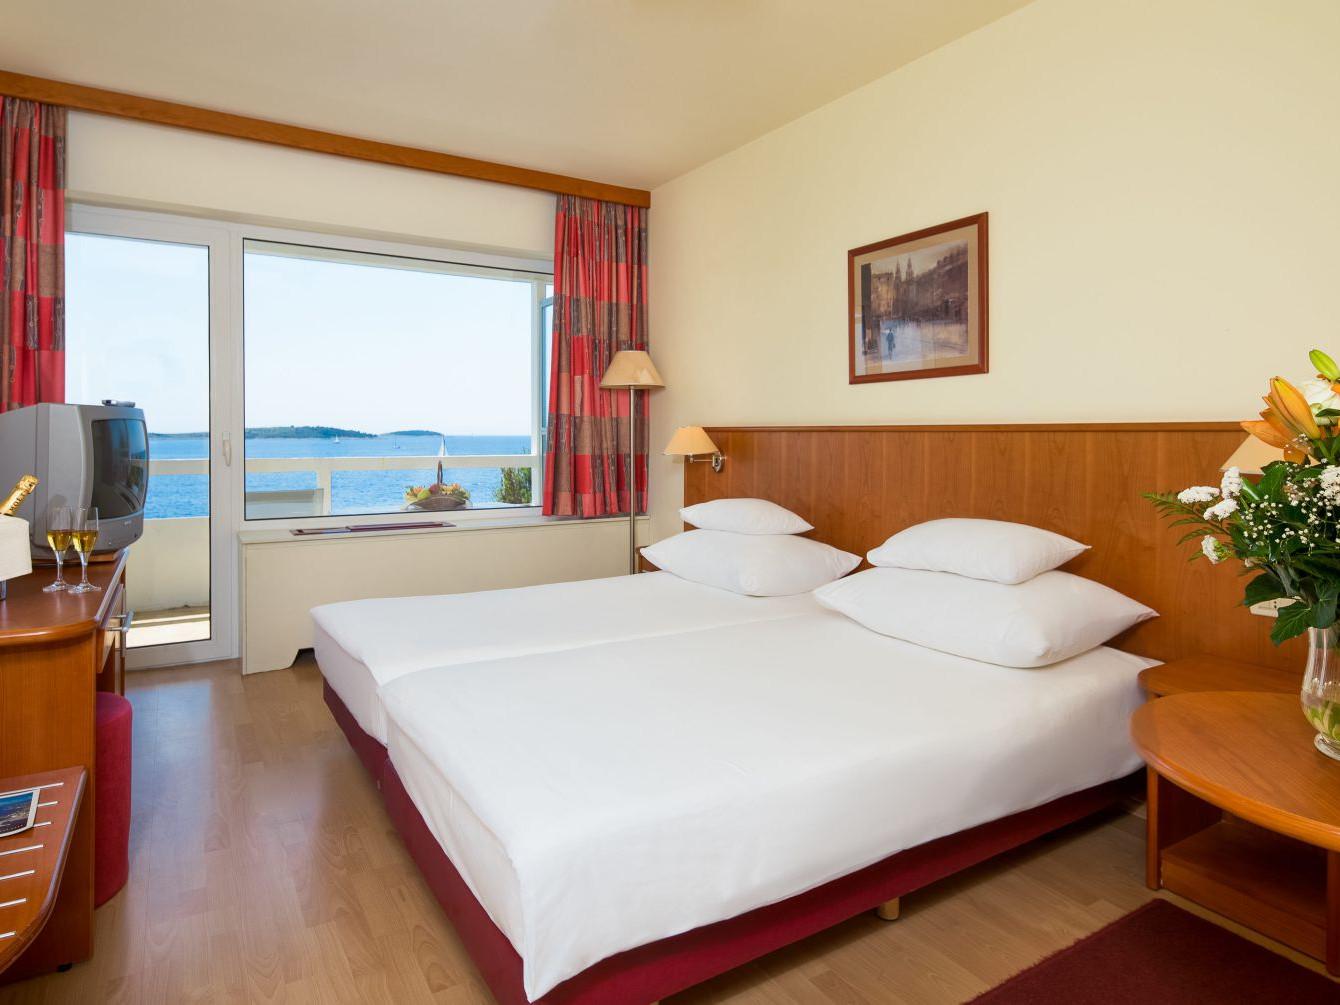 comfort room 01 14638698810 o uai - Zora Hotel